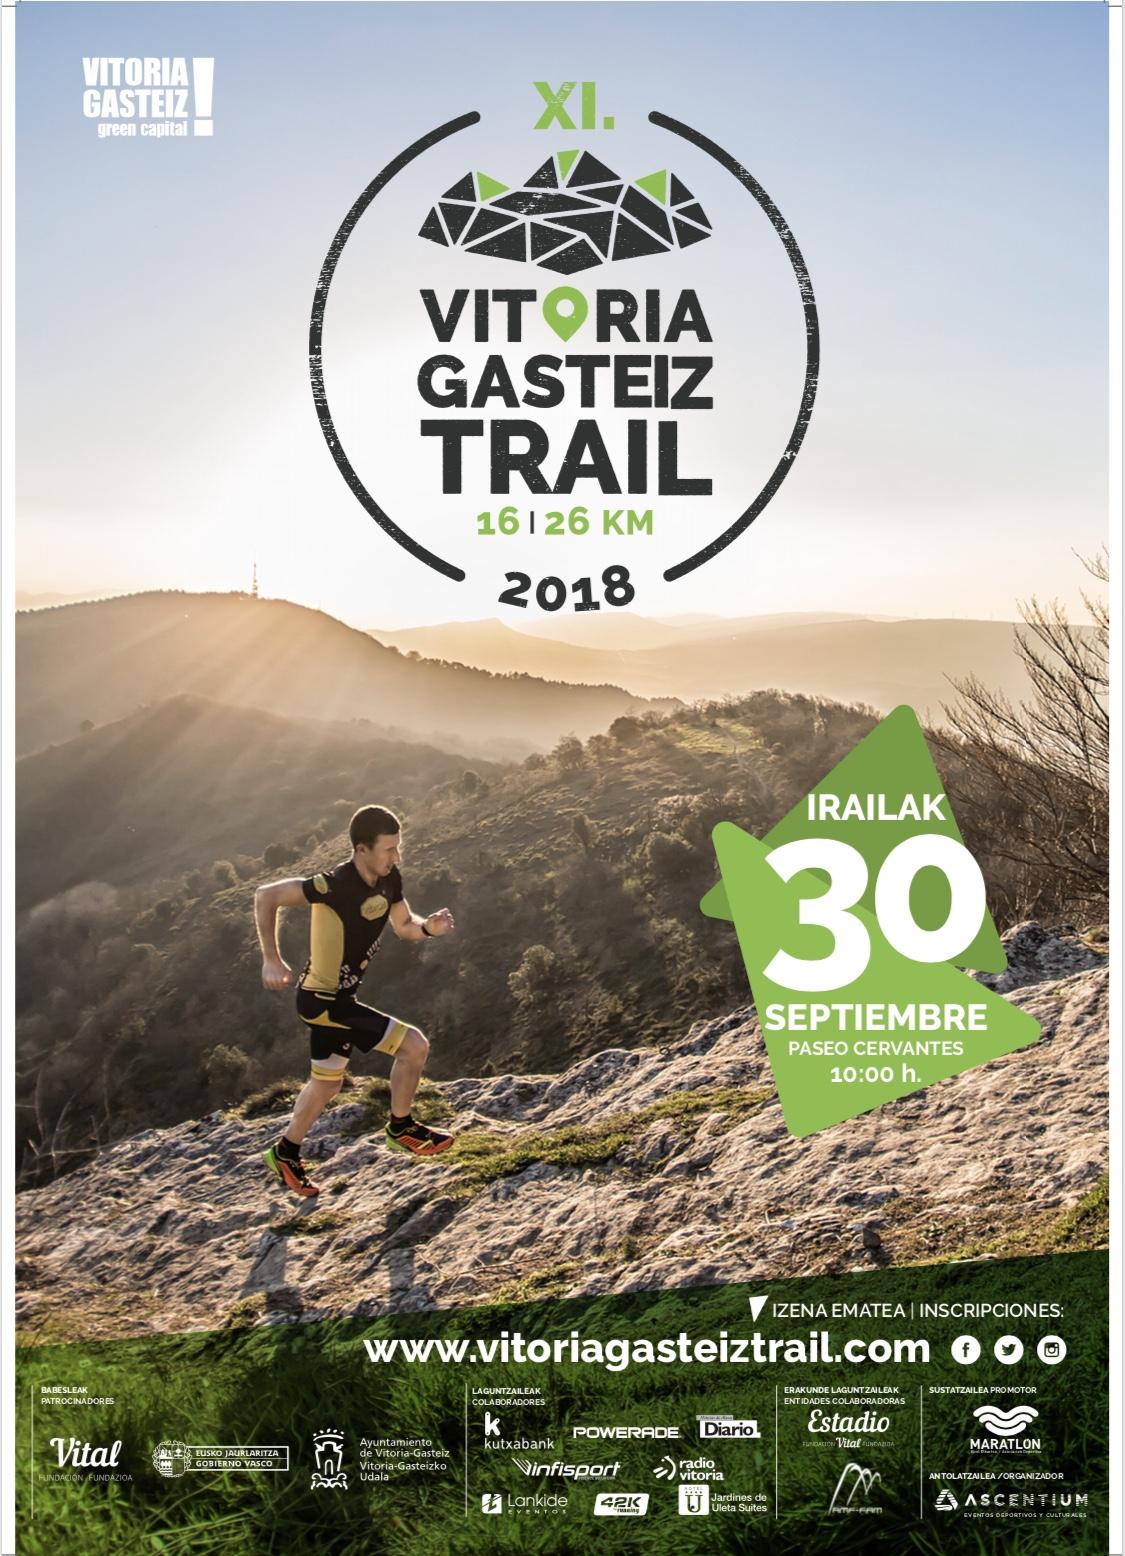 XI VITORIA-GASTEIZ TRAIL – INSCRIPCIONES Y OFERTA